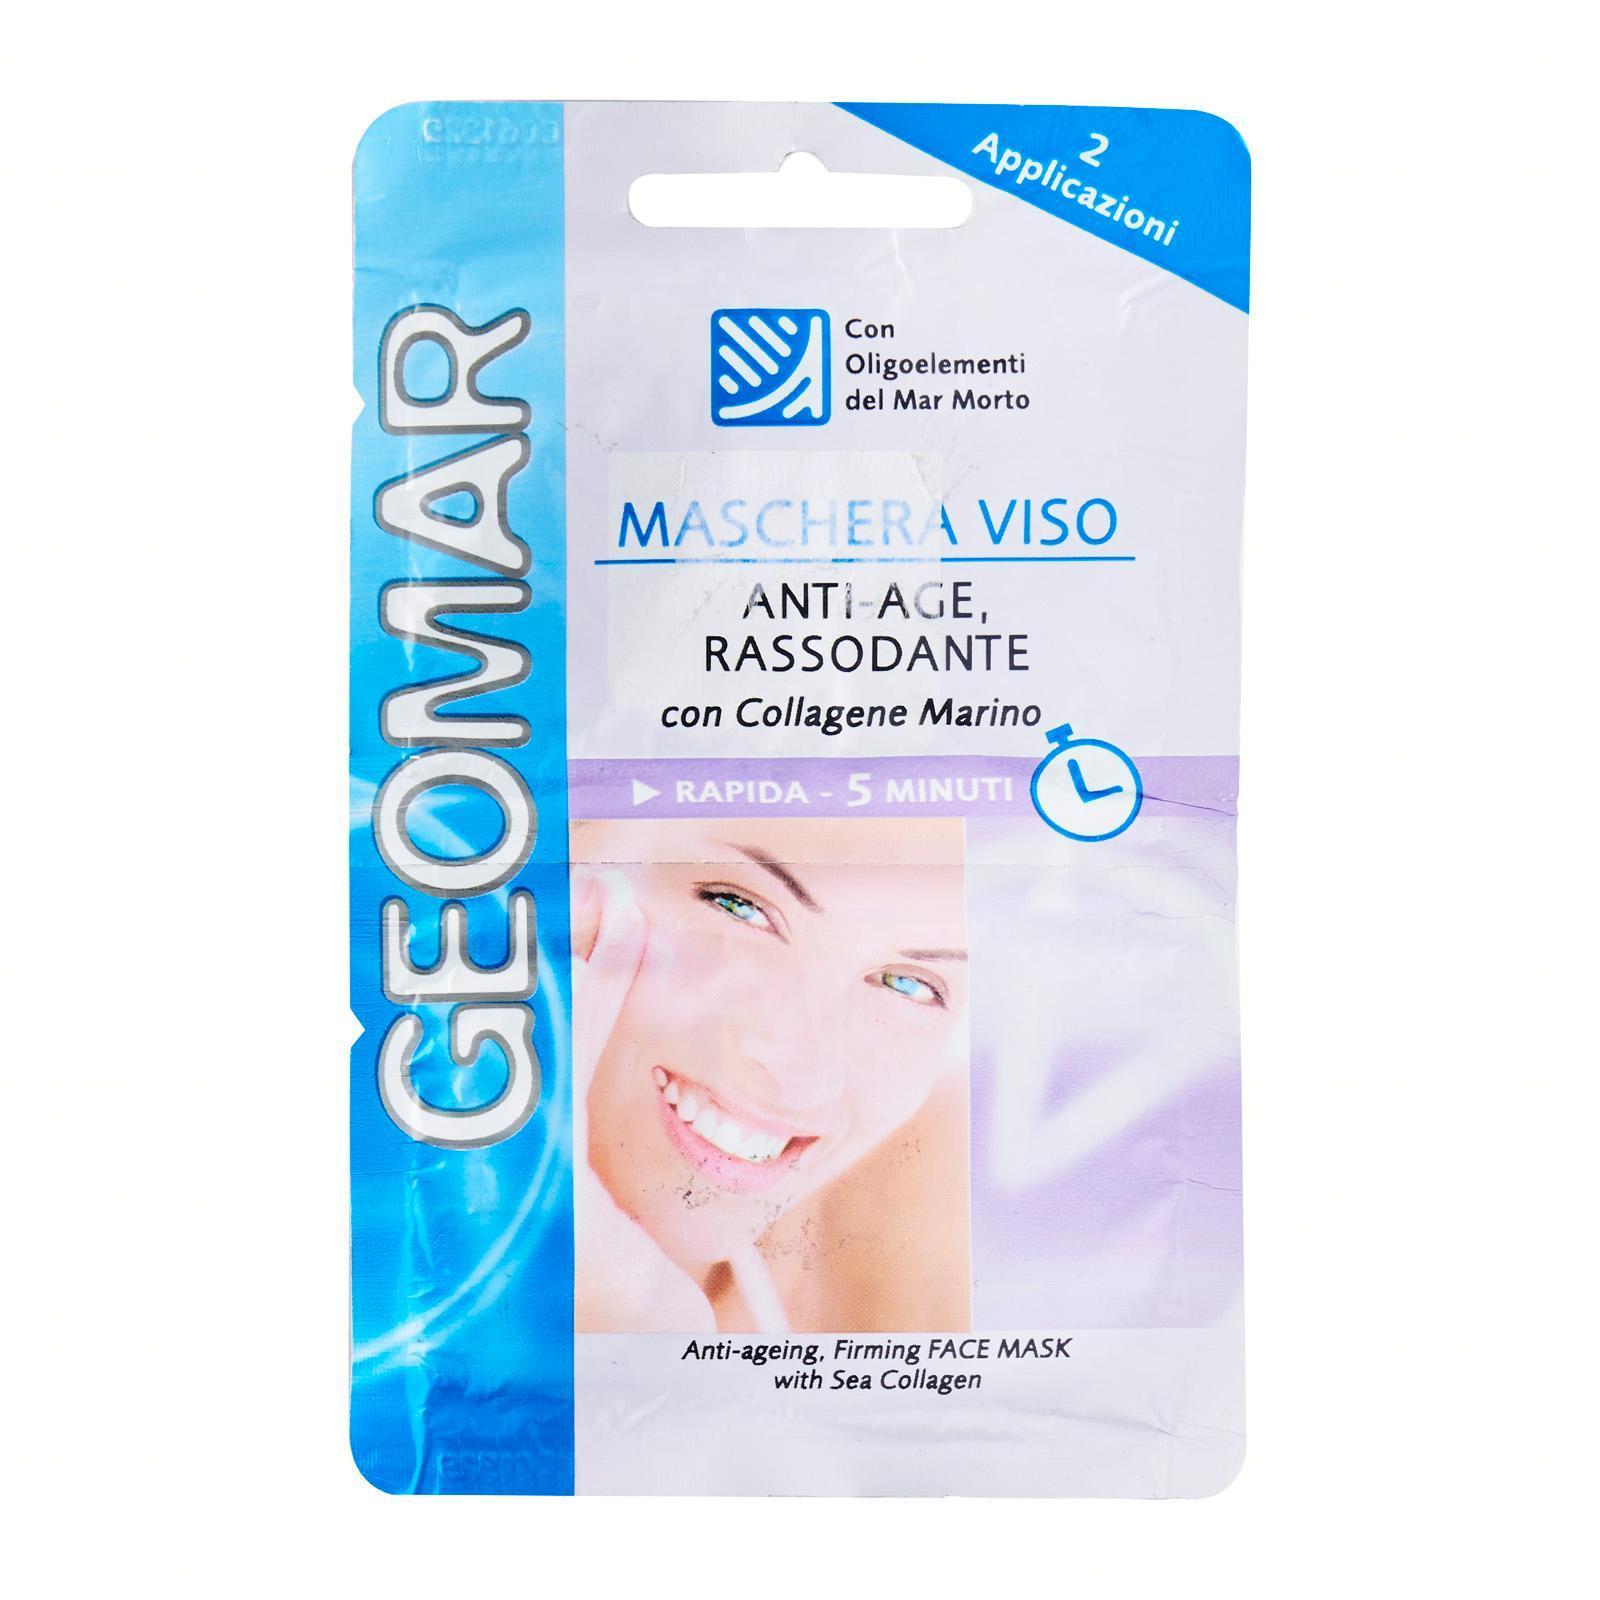 Geomar Anti-Aging Face Musk 2 Usage